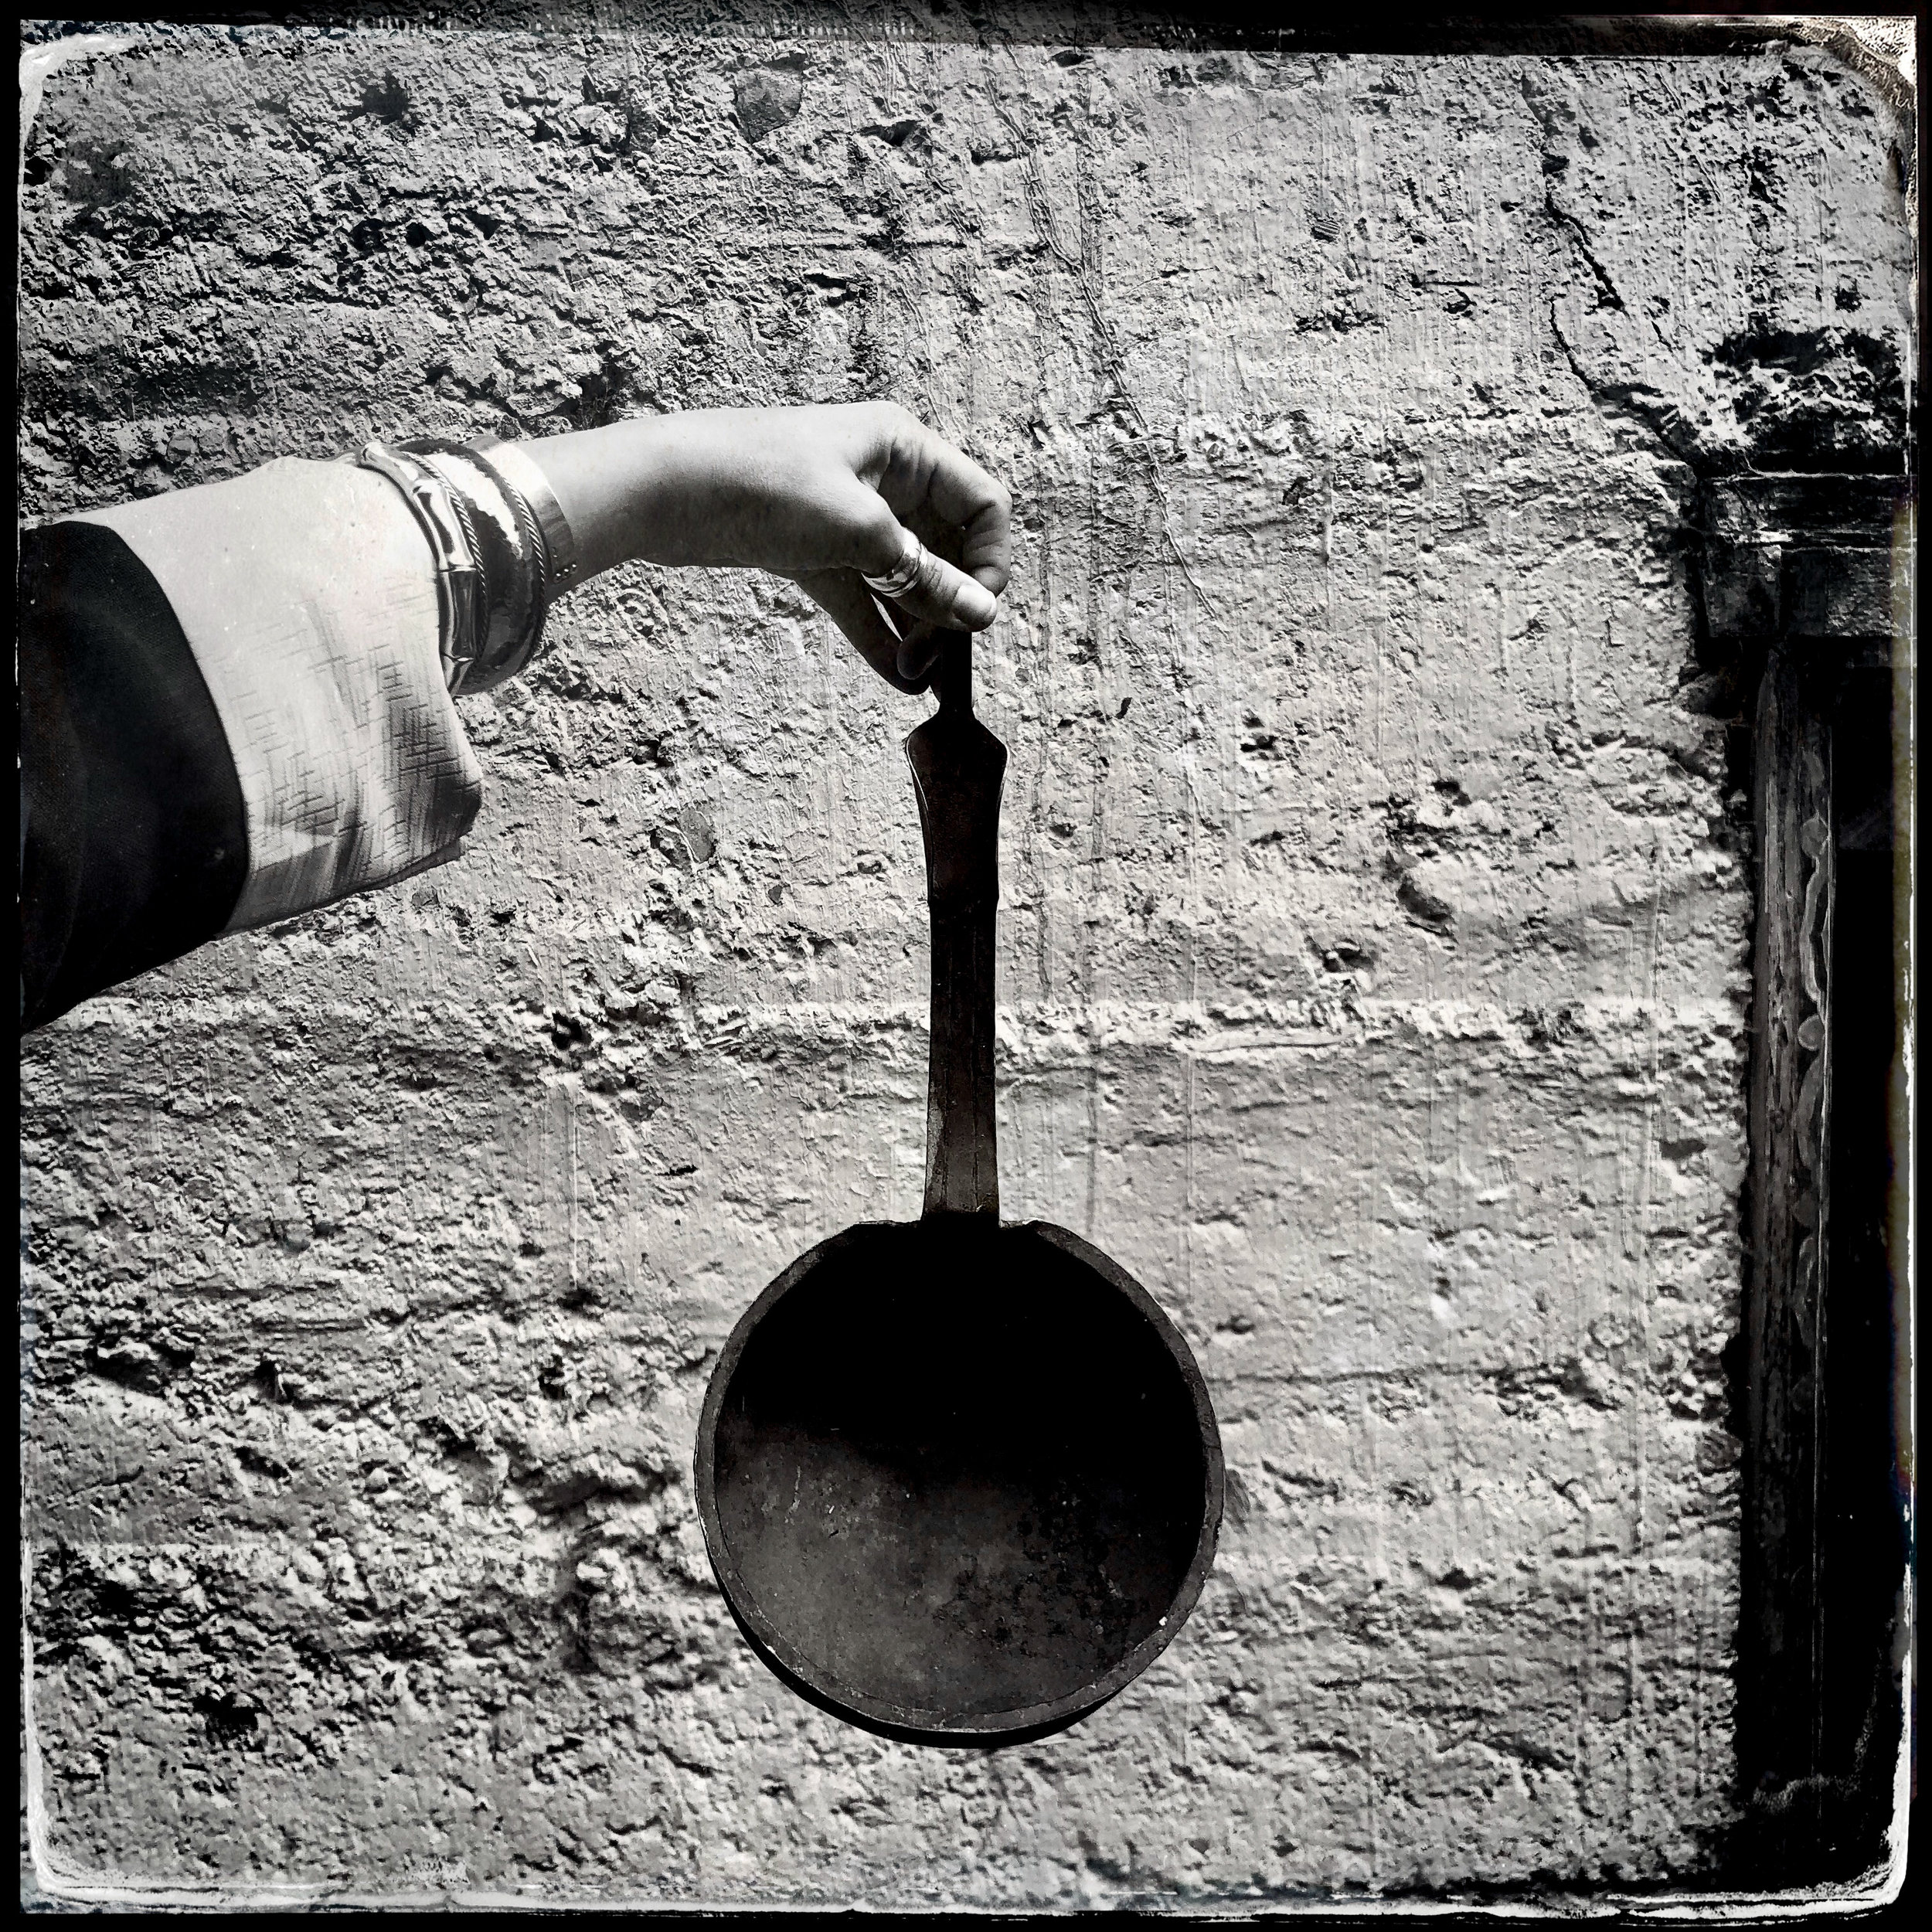 Spoon Gifts at Songzanlin Monastery / Shangri-La, Tibet